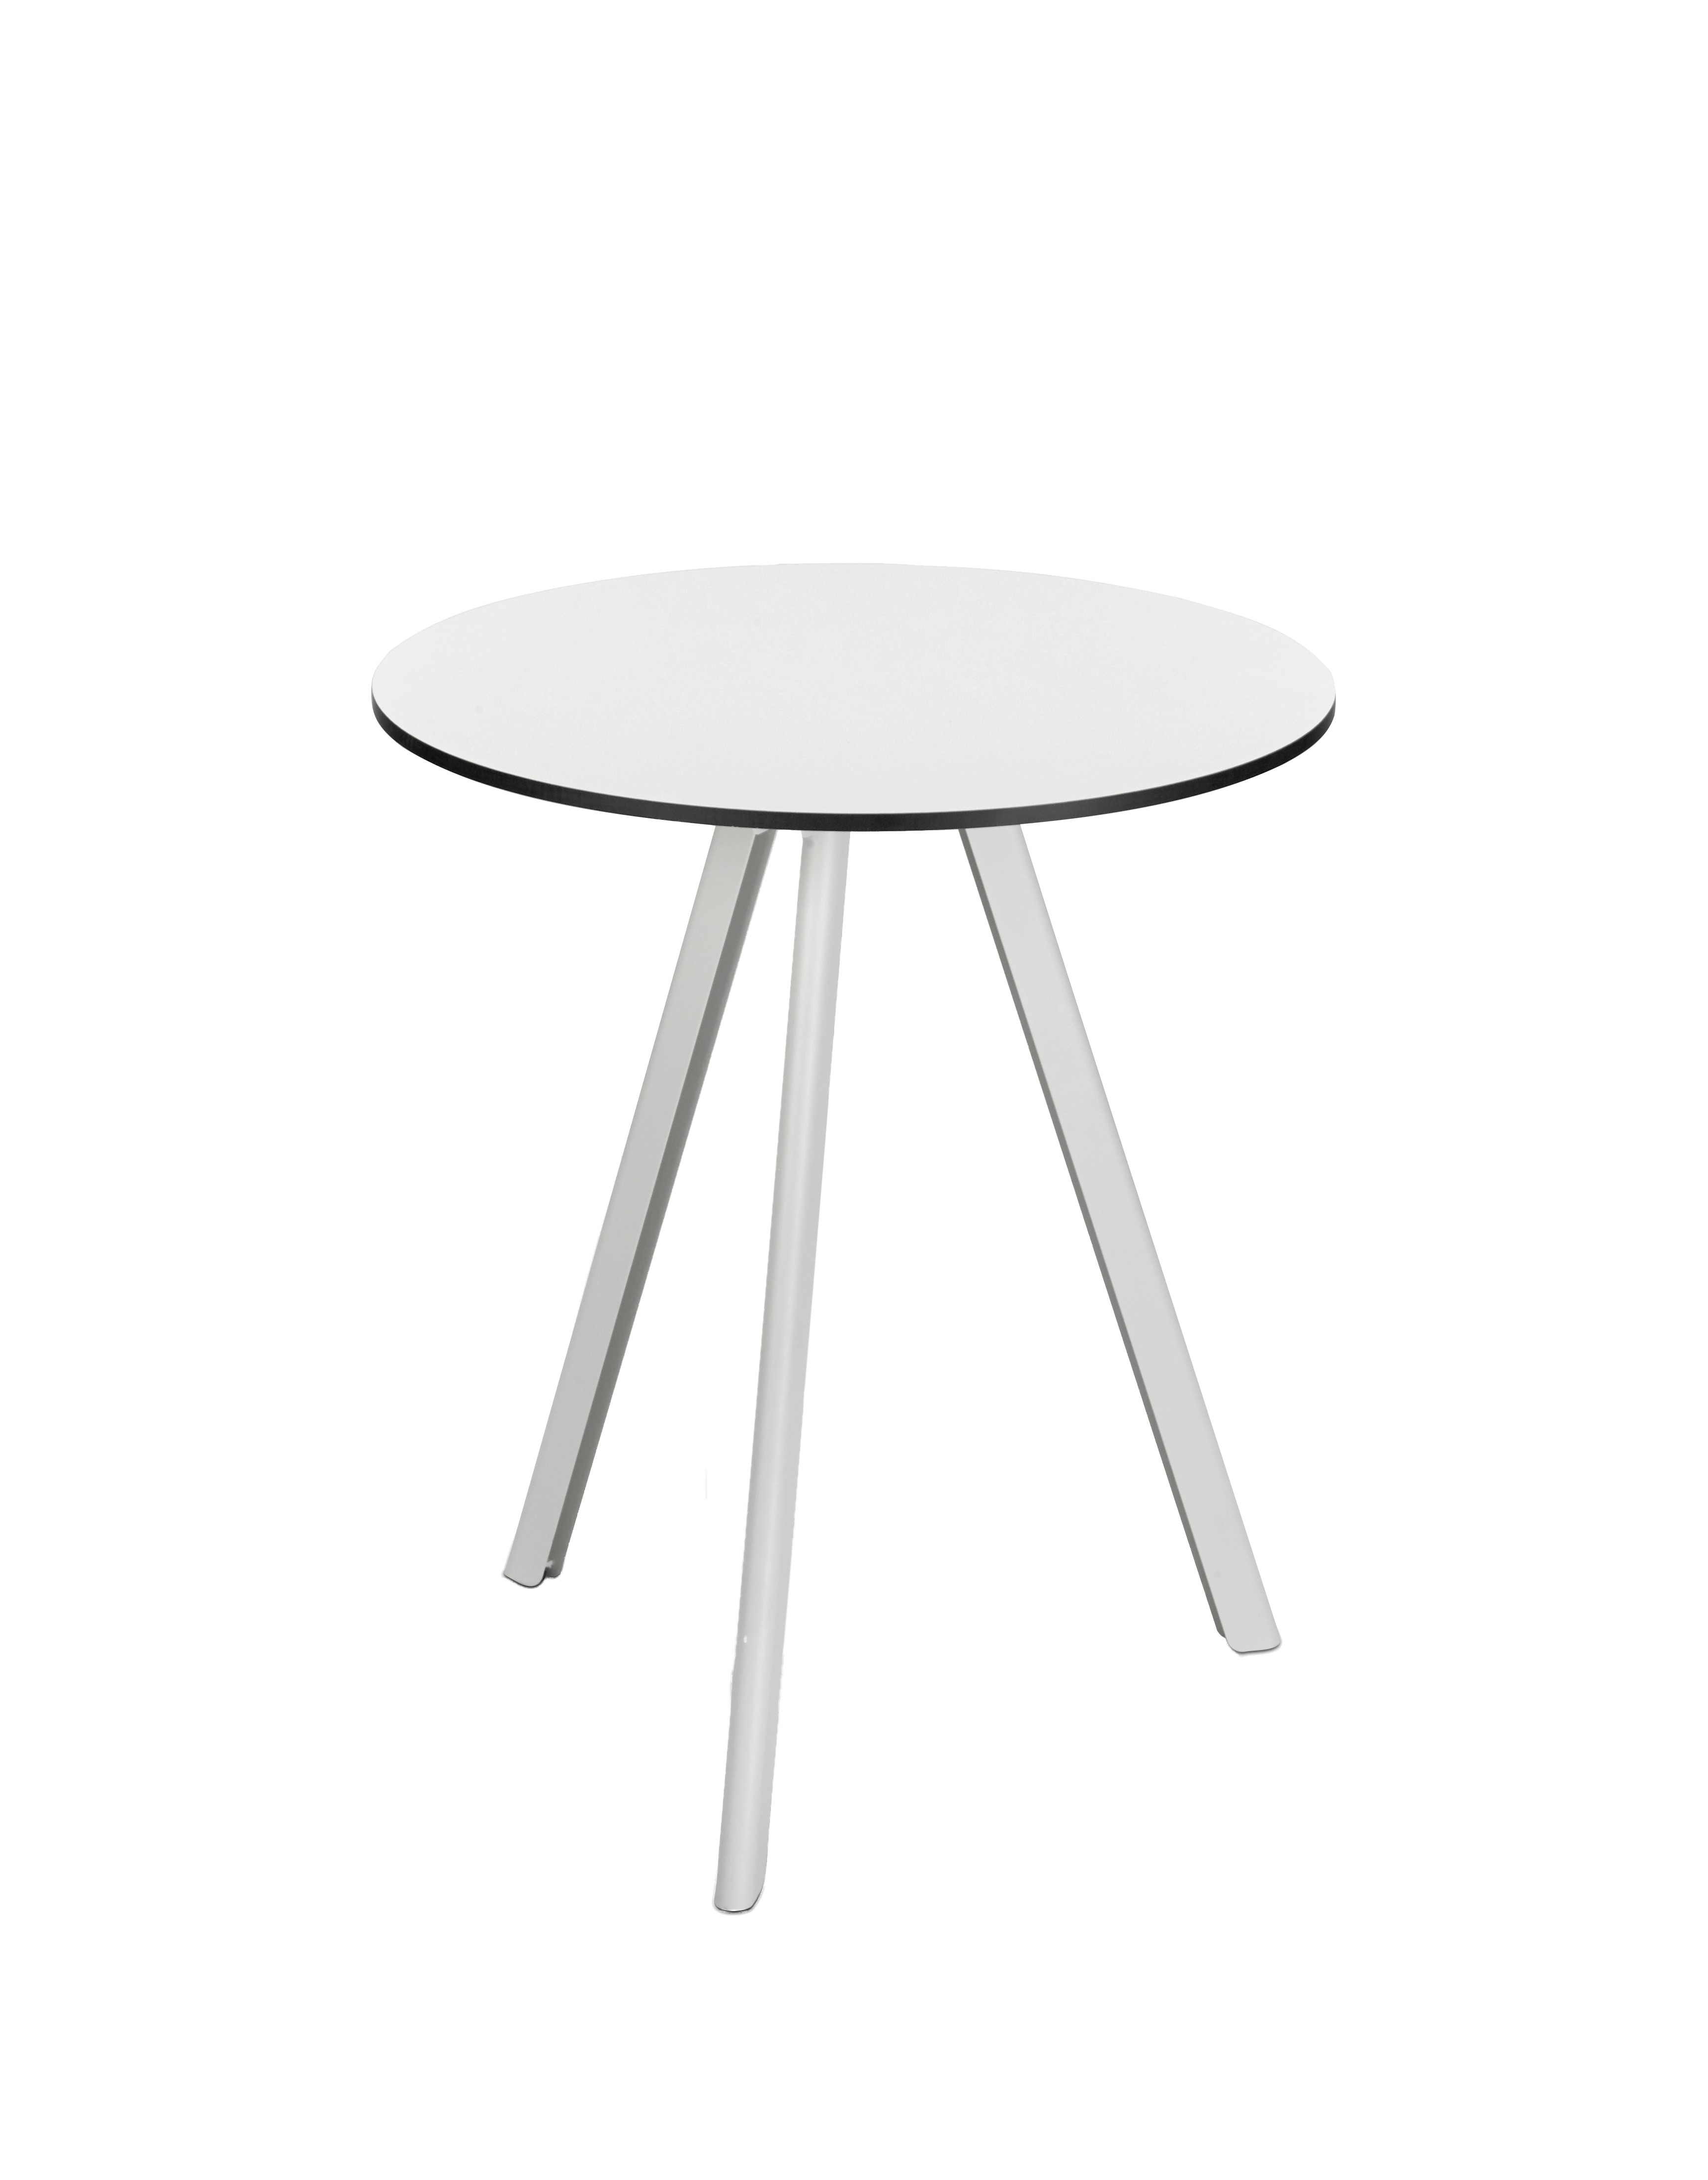 table d 39 appoint overlap de skagerak d 62 blanc argent. Black Bedroom Furniture Sets. Home Design Ideas